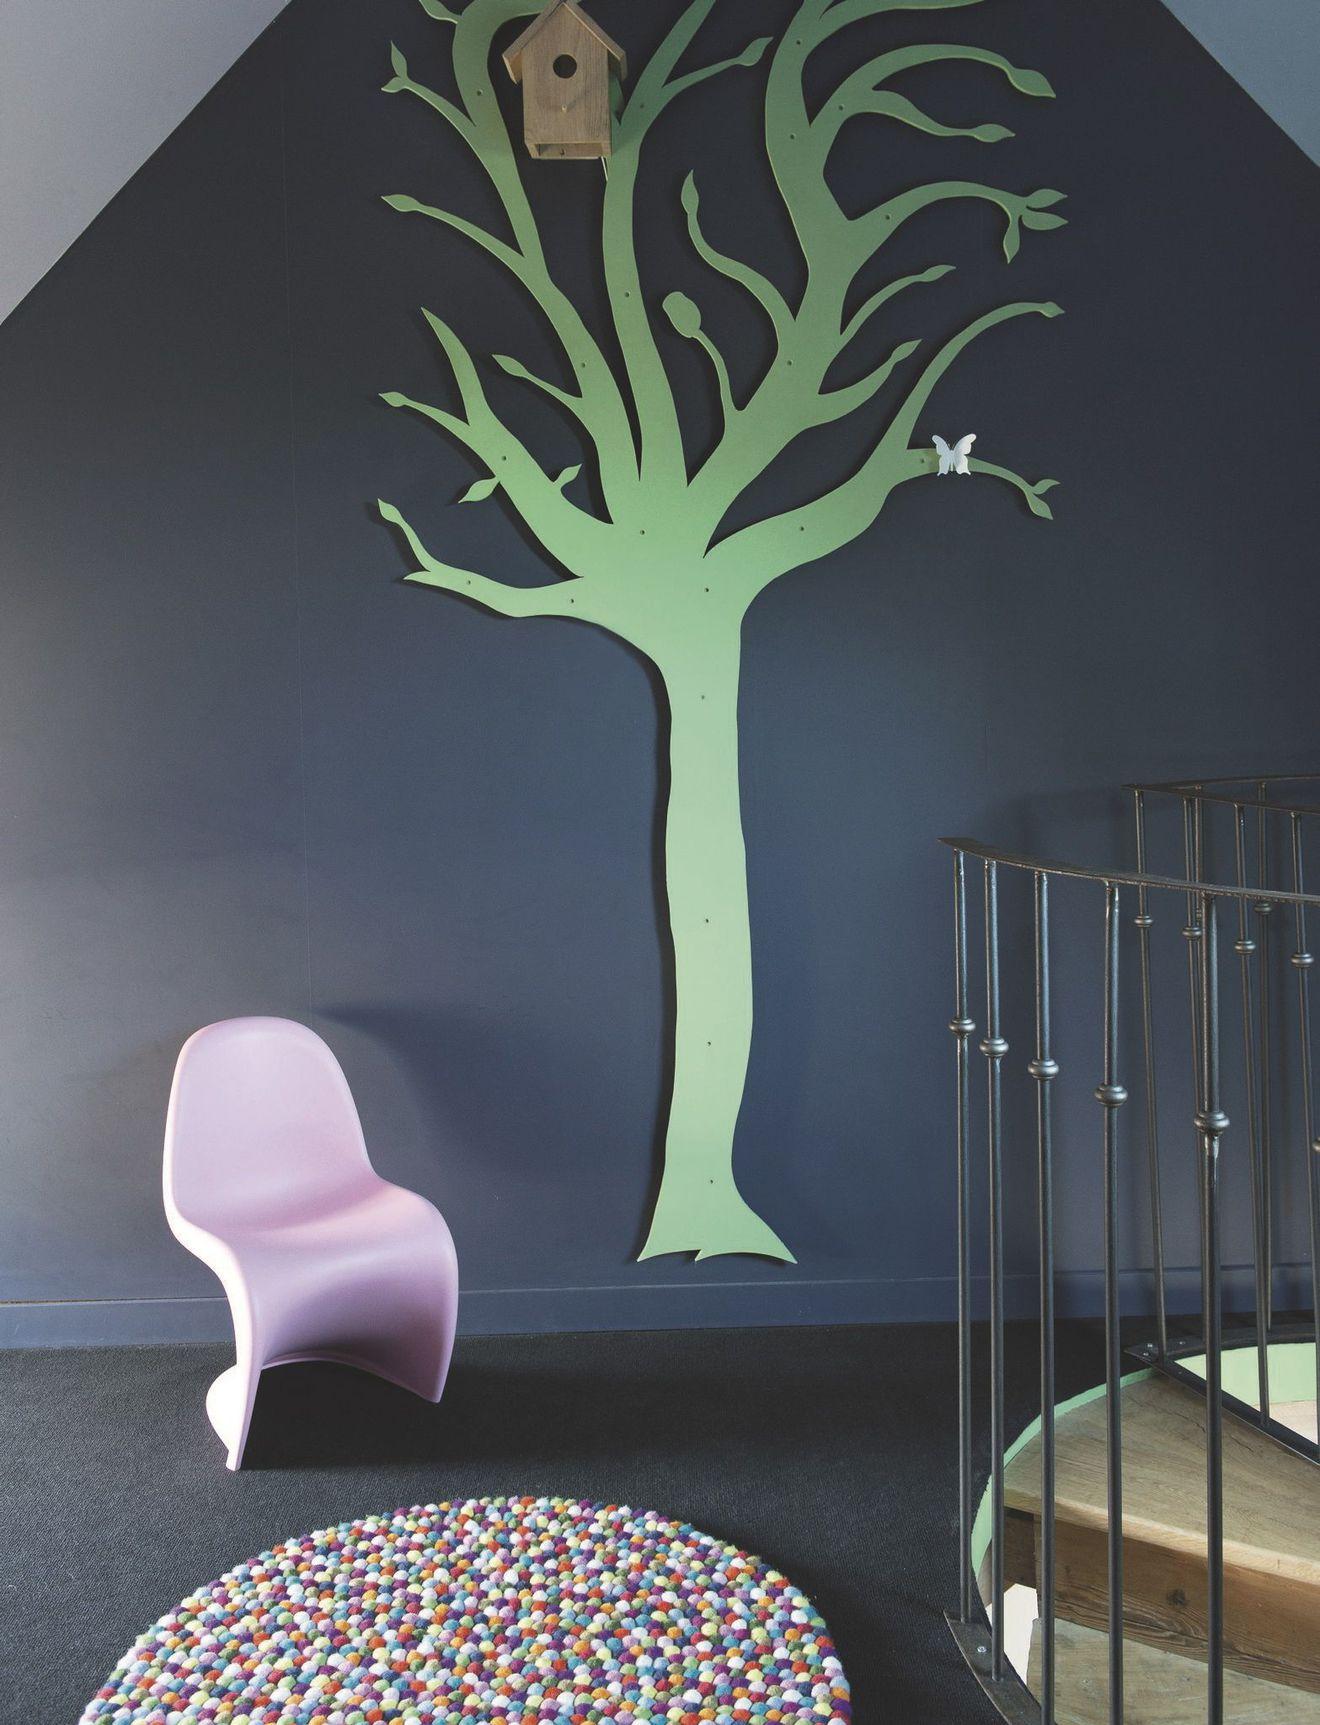 Объемная картина в виде дерева